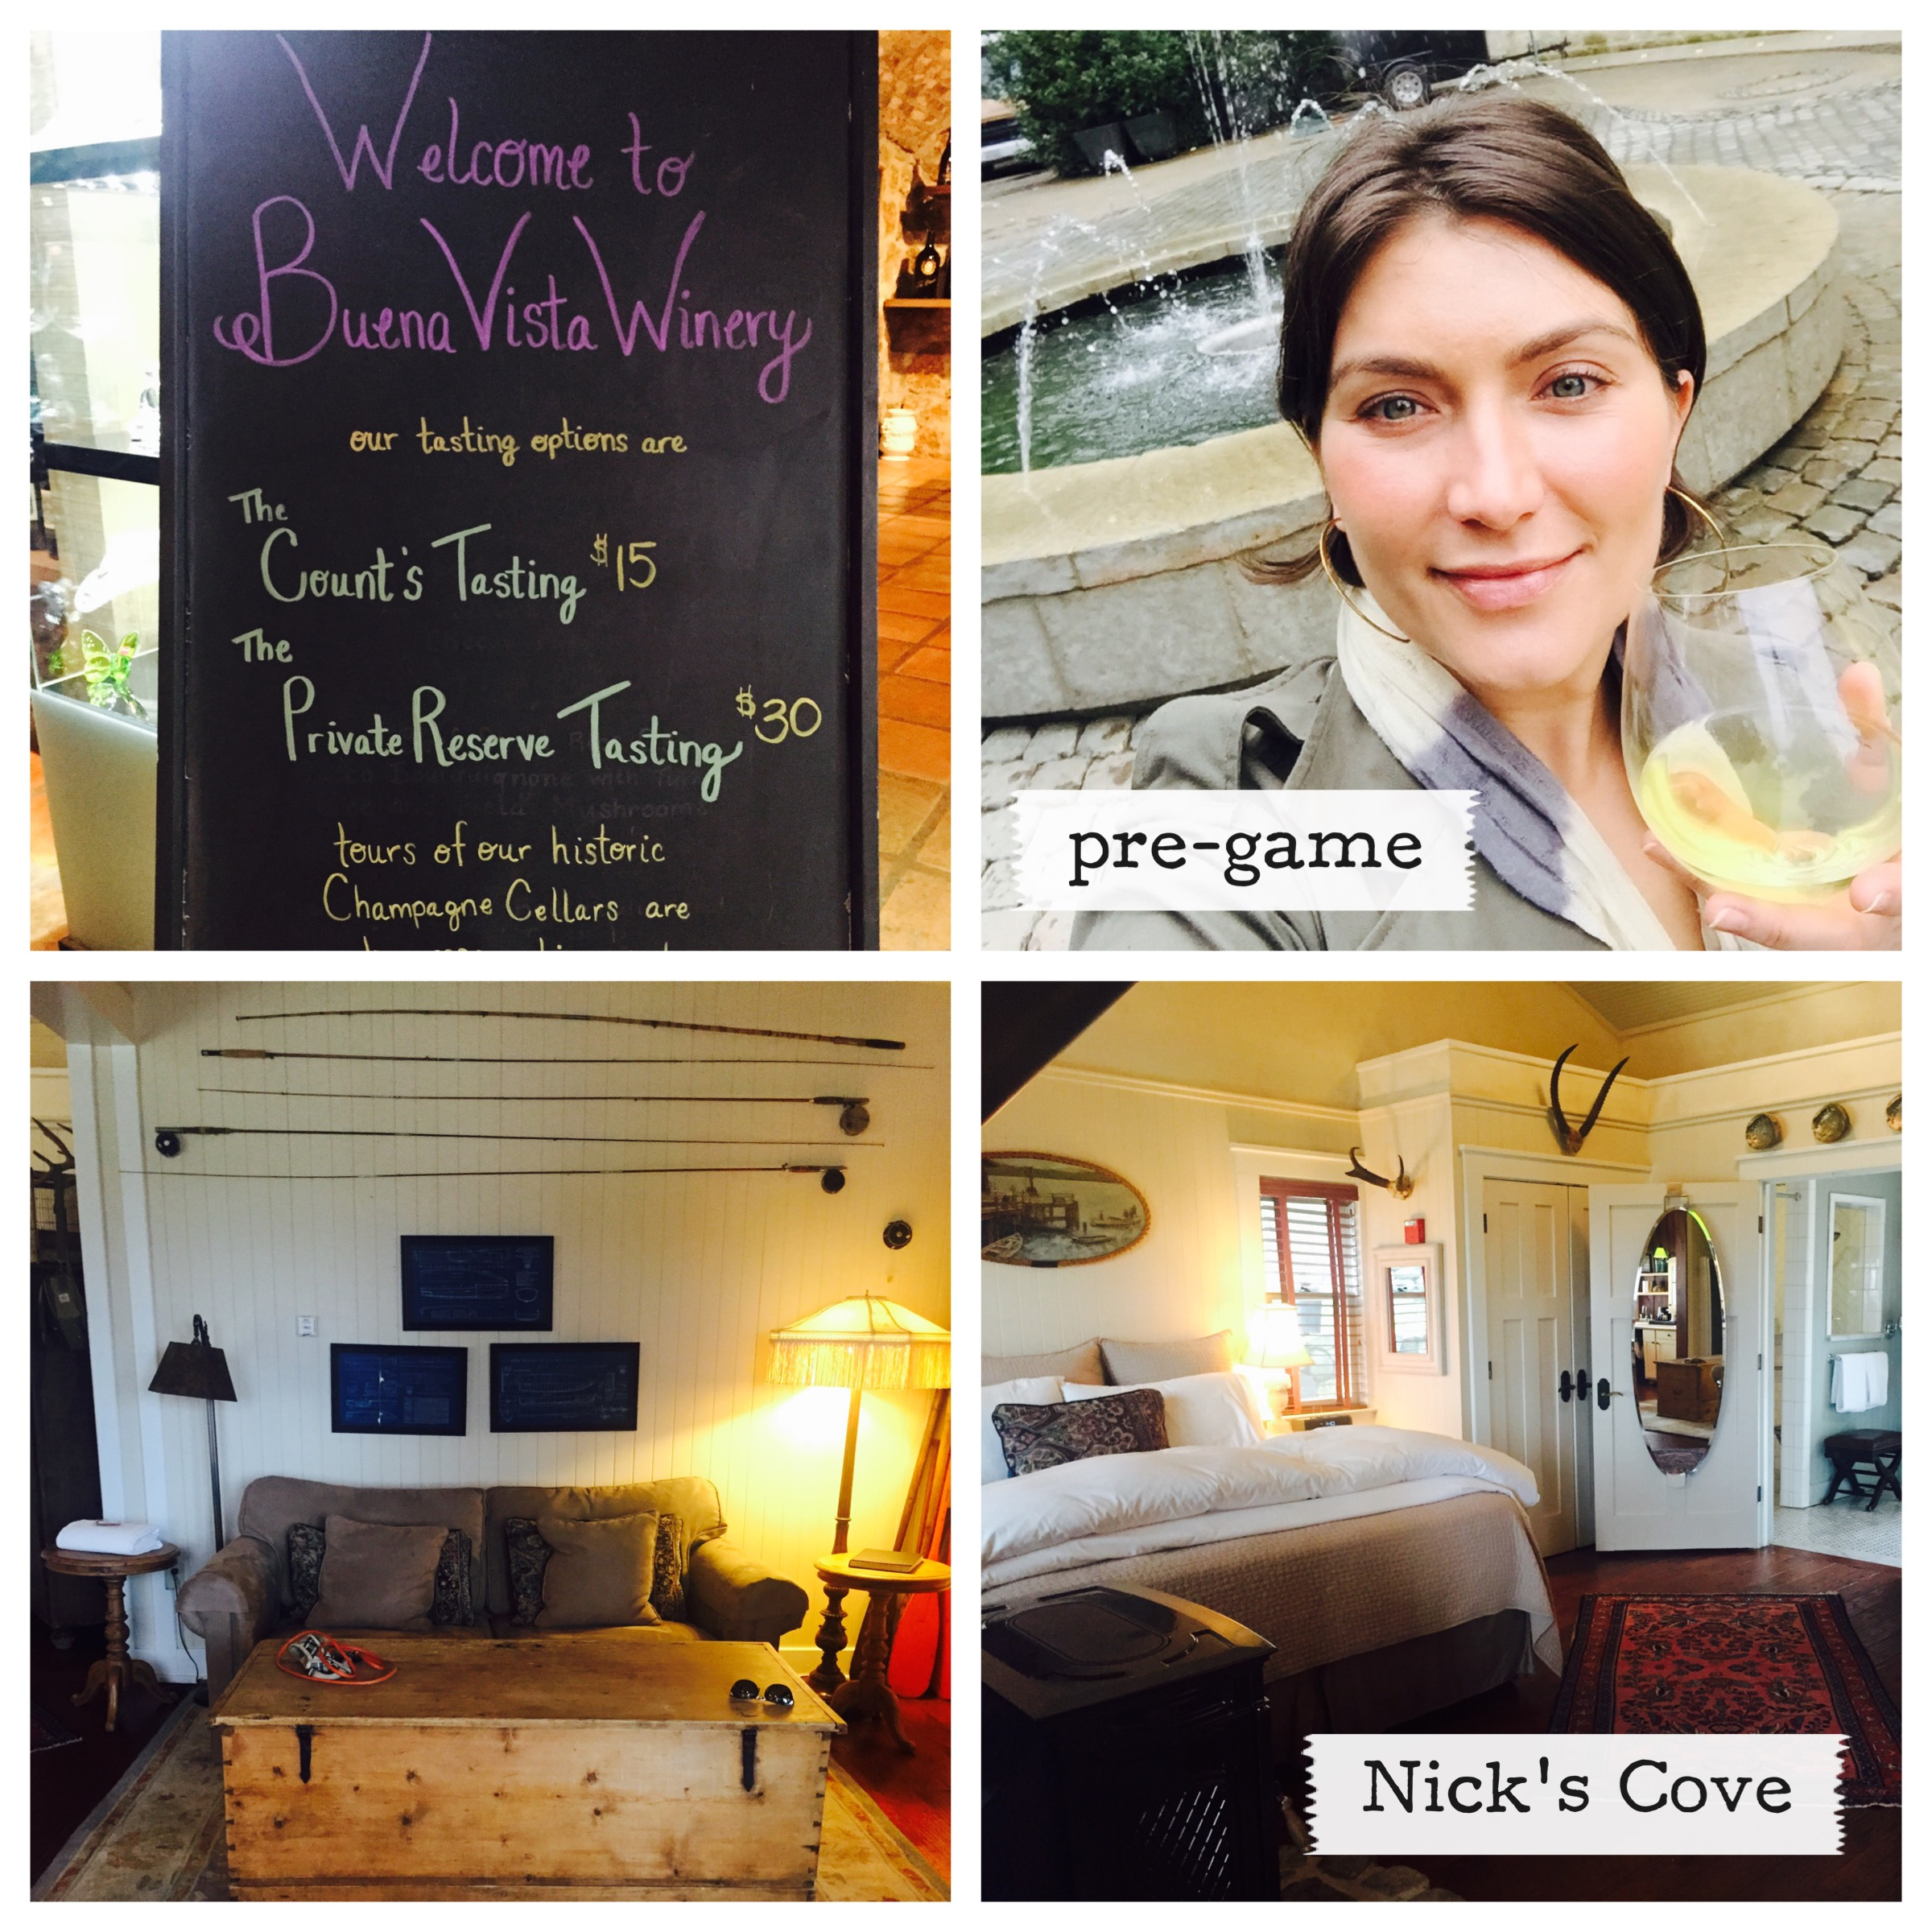 Buena Vista Winery and Nick's Cove